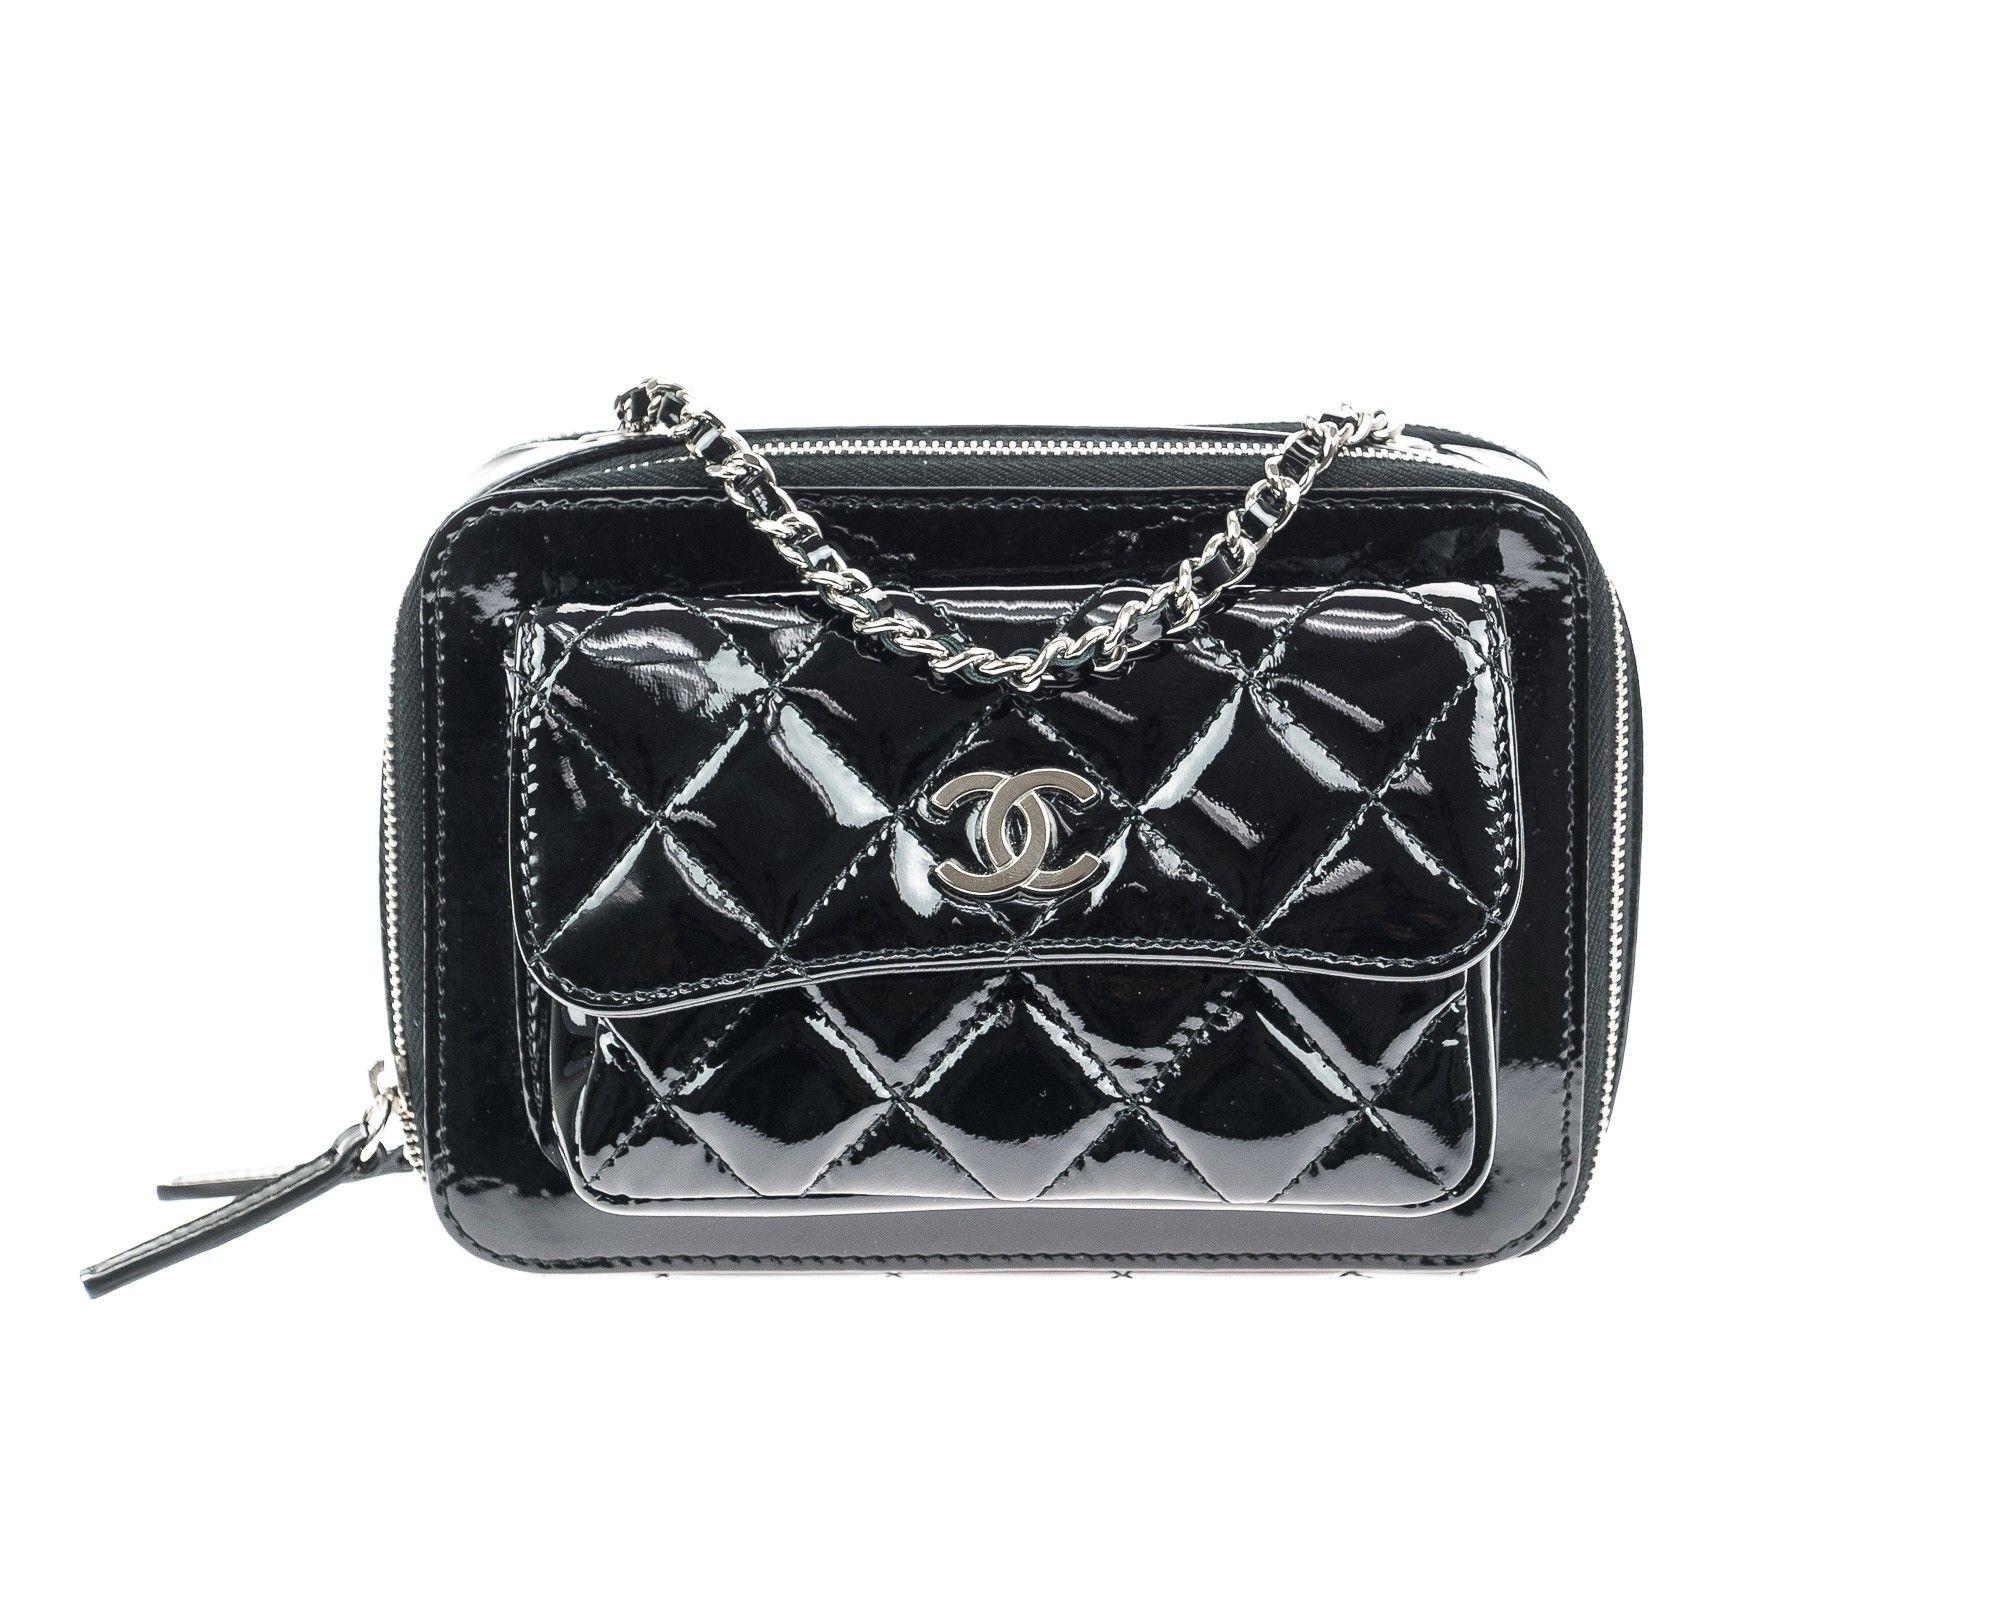 0665ddab1934 Chanel Black Quilted Patent Leather Mini Camera Bag - This Chanel Black  Quilted Patent Leather Mini